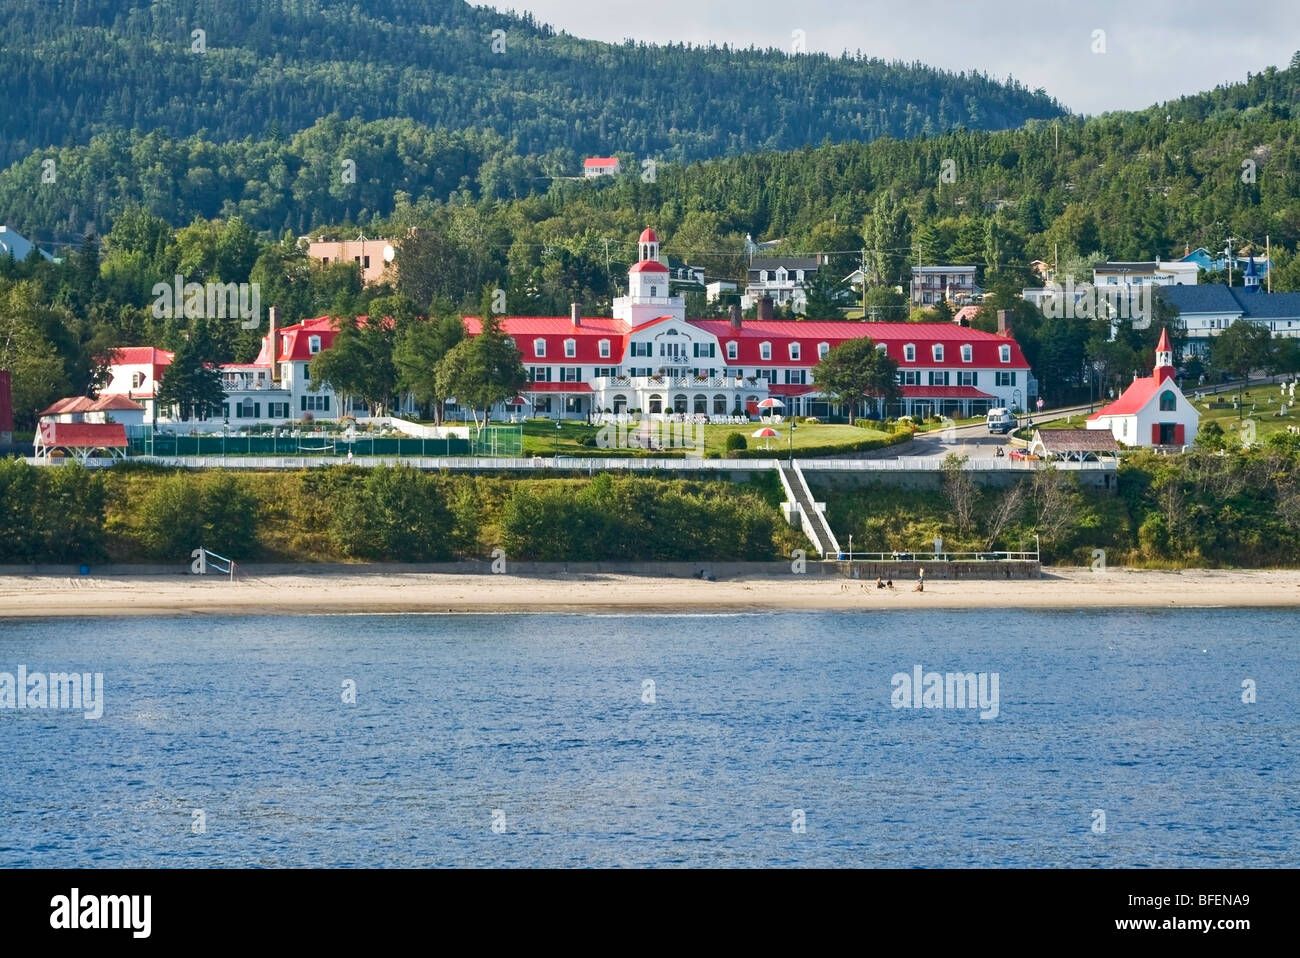 Historisches Hotel Tadoussac und Kapelle der Indianer, Tadoussac, Manicouagan, Quebec, Kanada Stockbild